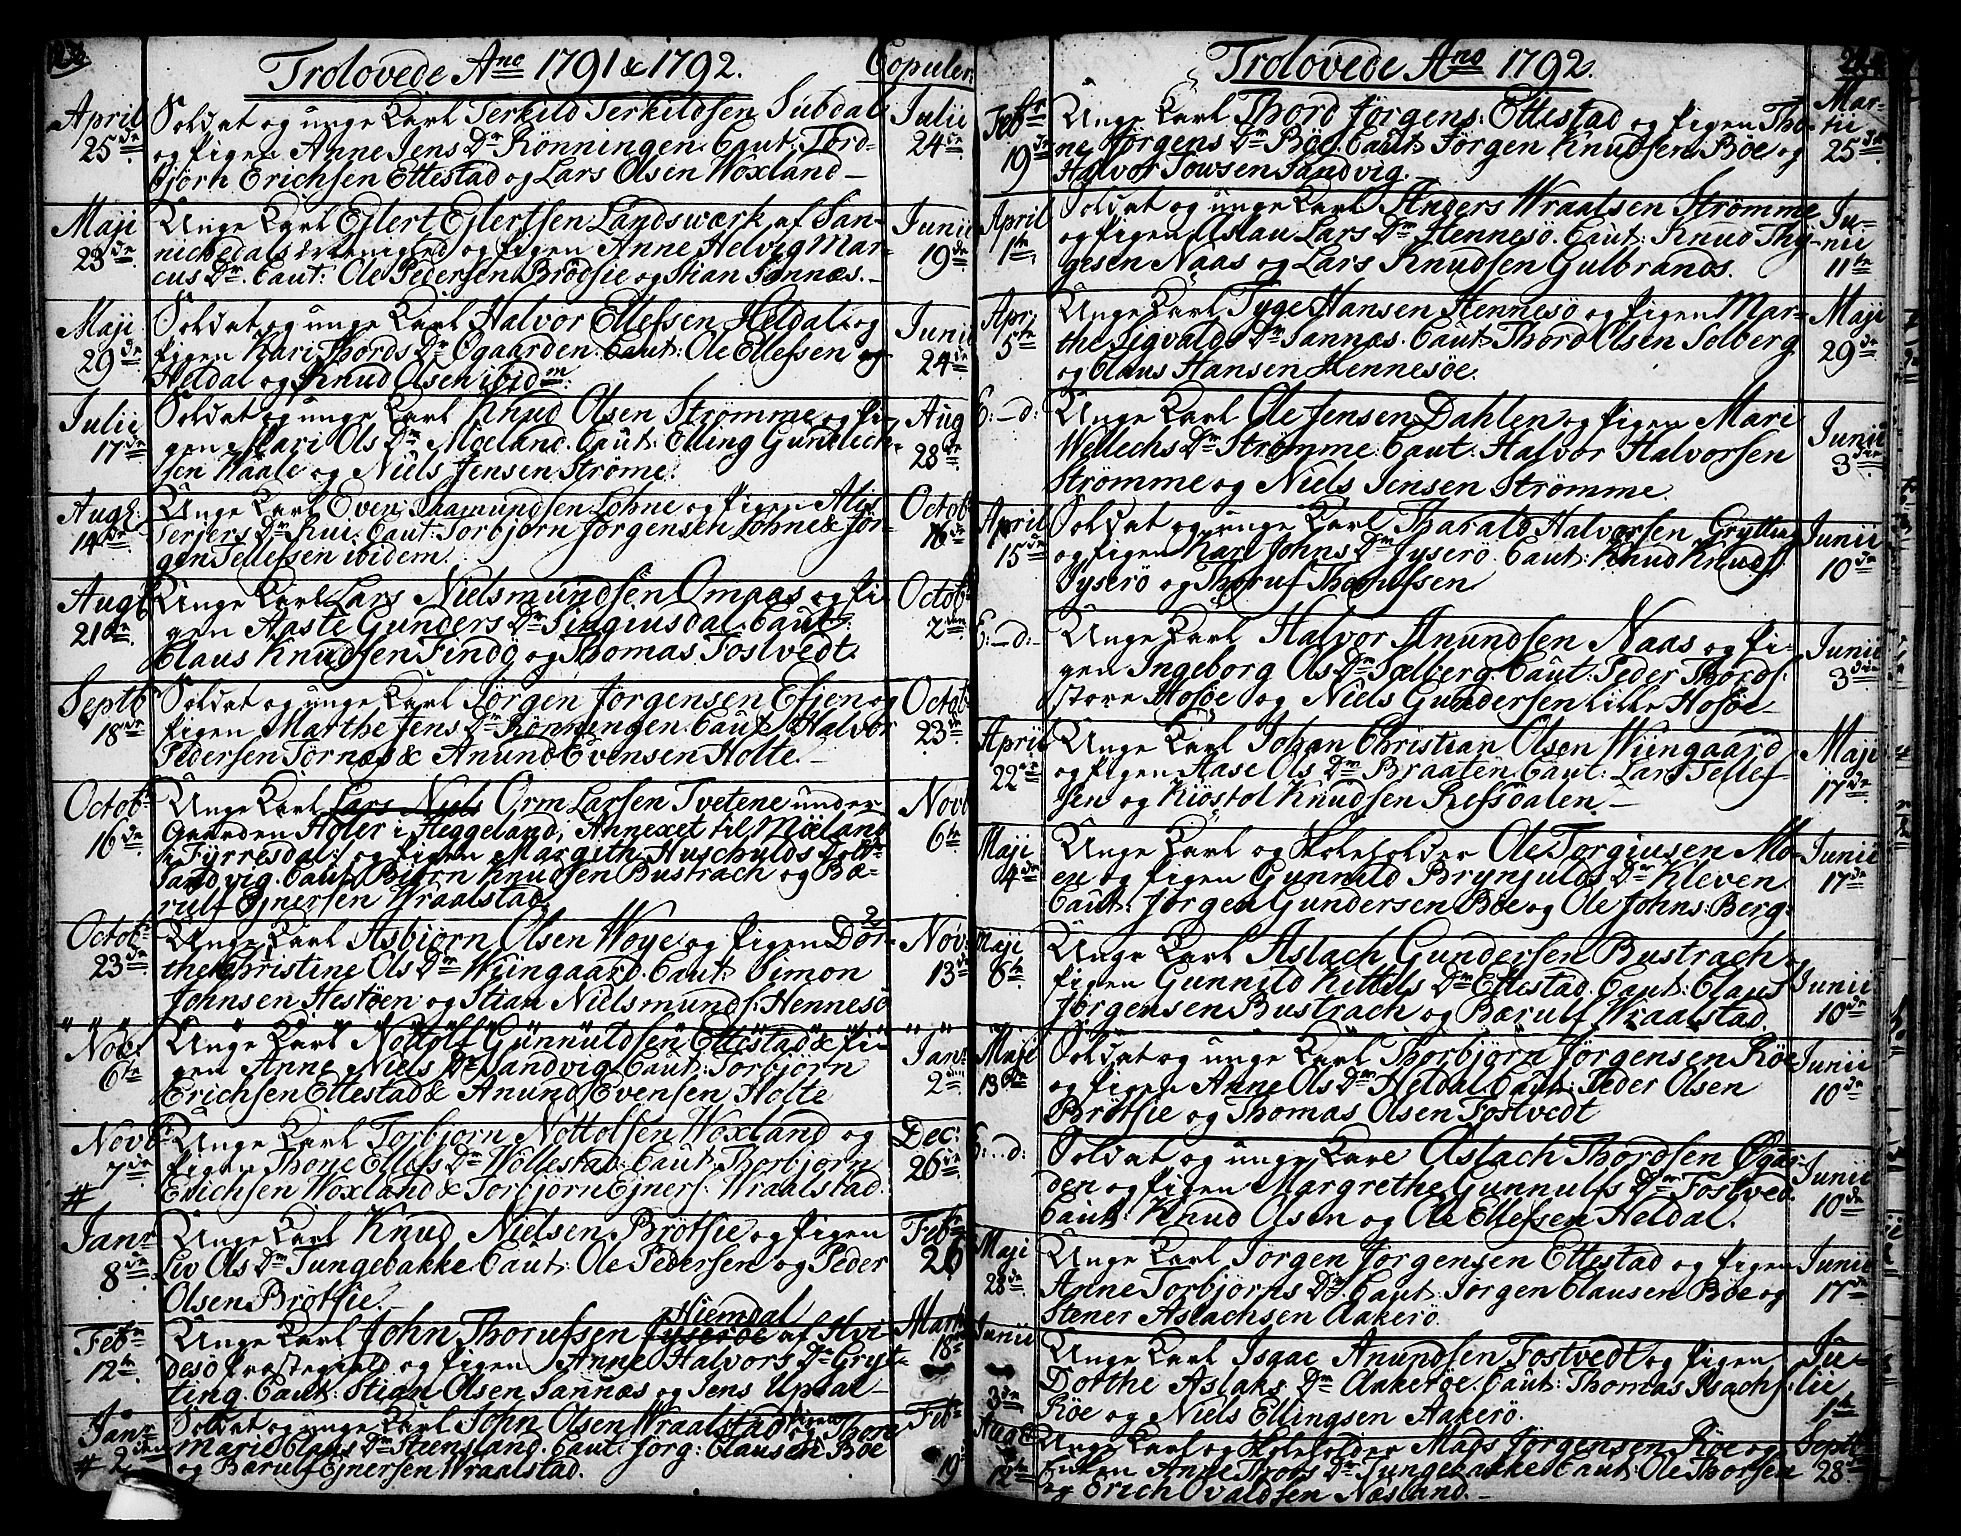 SAKO, Drangedal kirkebøker, F/Fa/L0003: Ministerialbok nr. 3, 1768-1814, s. 223-224